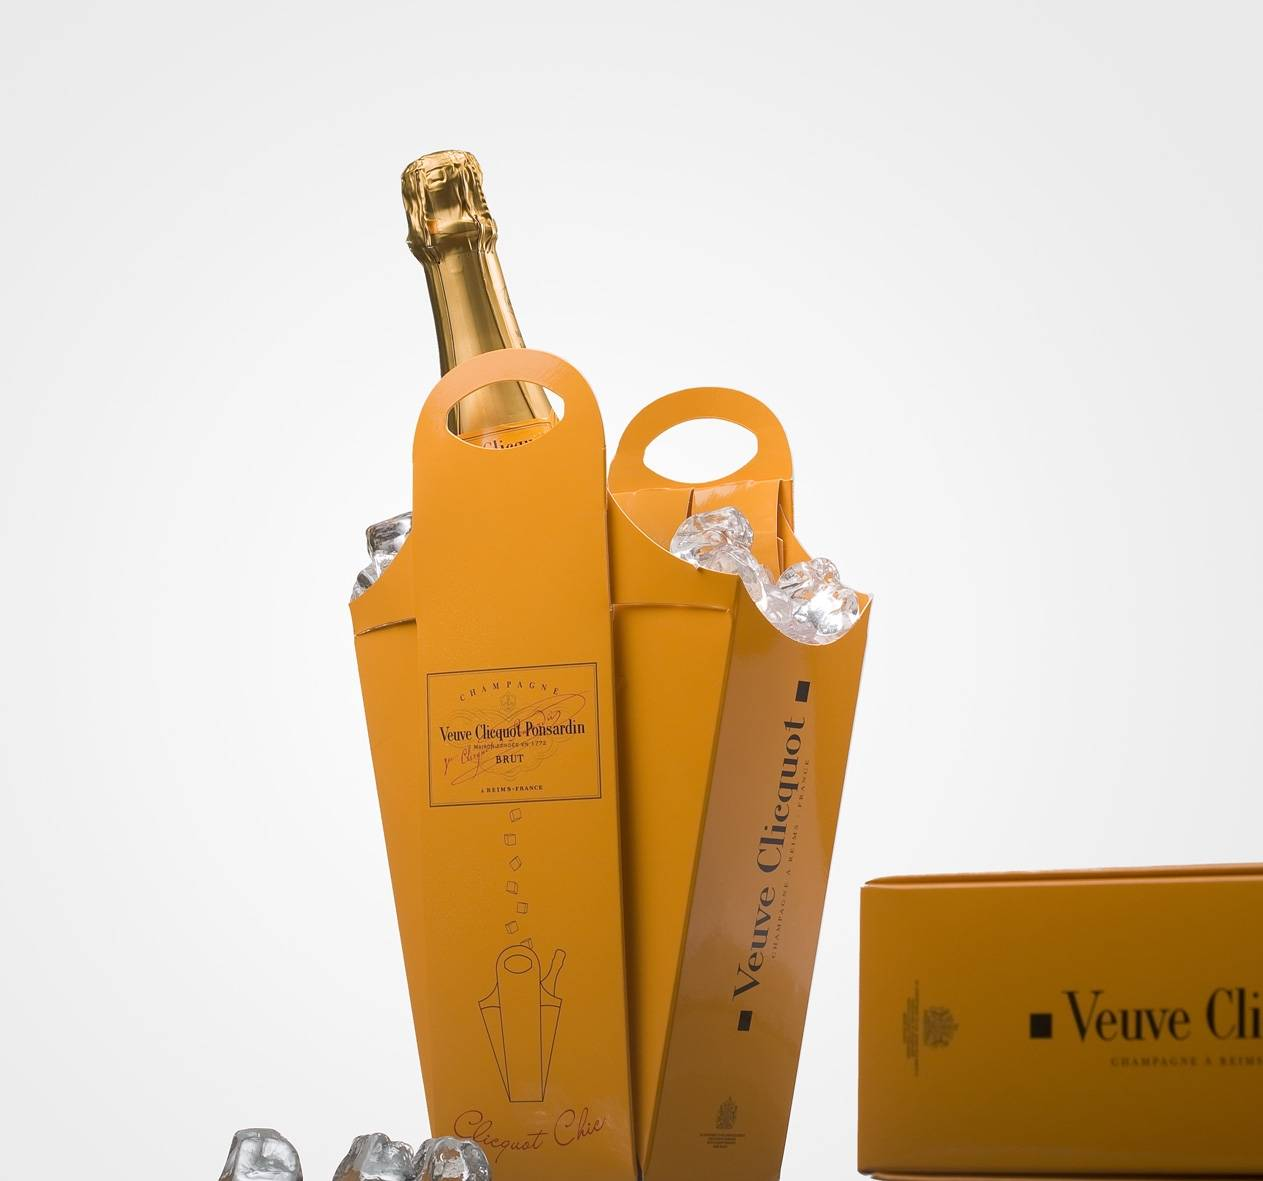 Veuve Clicquot (tricky box)